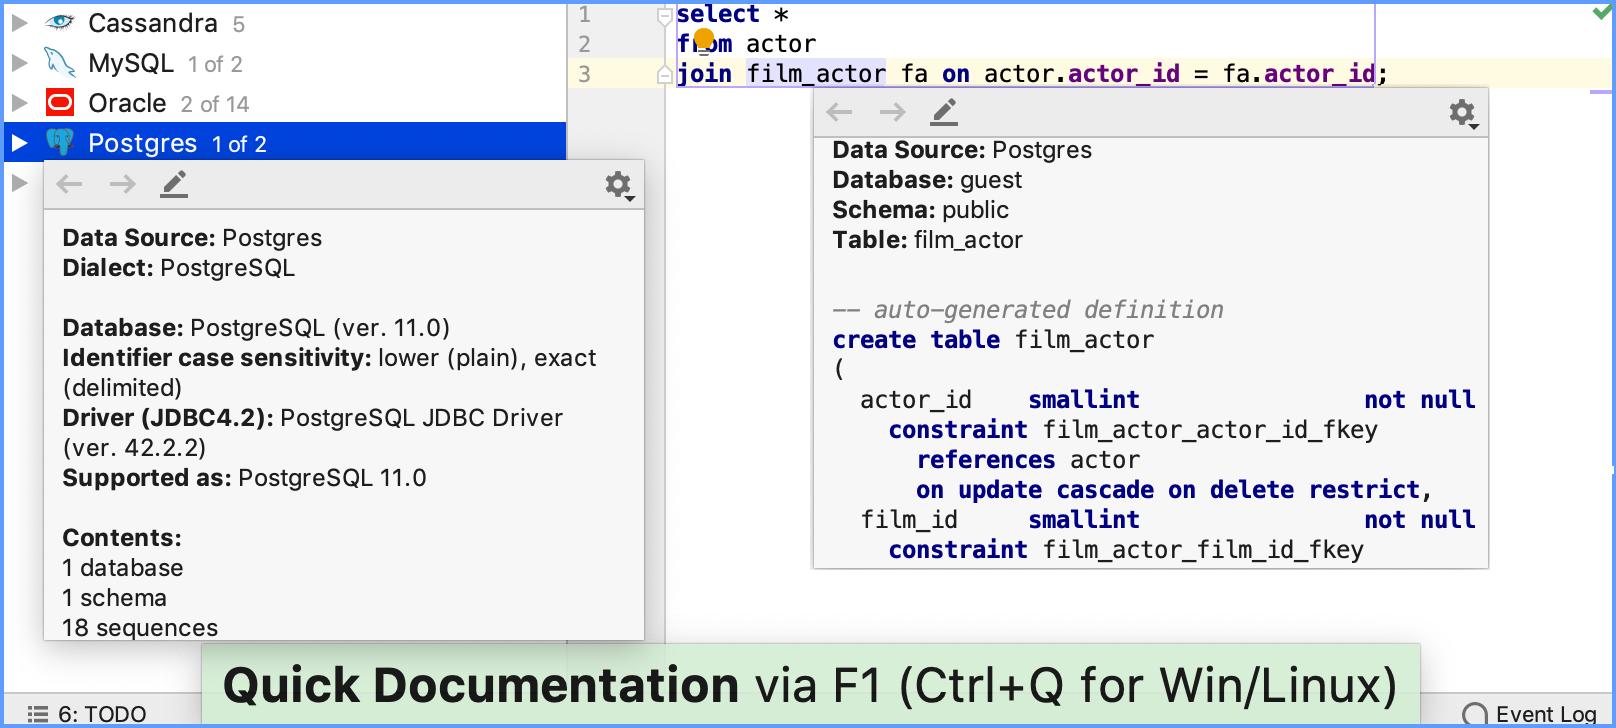 Database Tree Help Datagrip Diagram Symbols Besides Automotive Electrical On View Quick Documentation